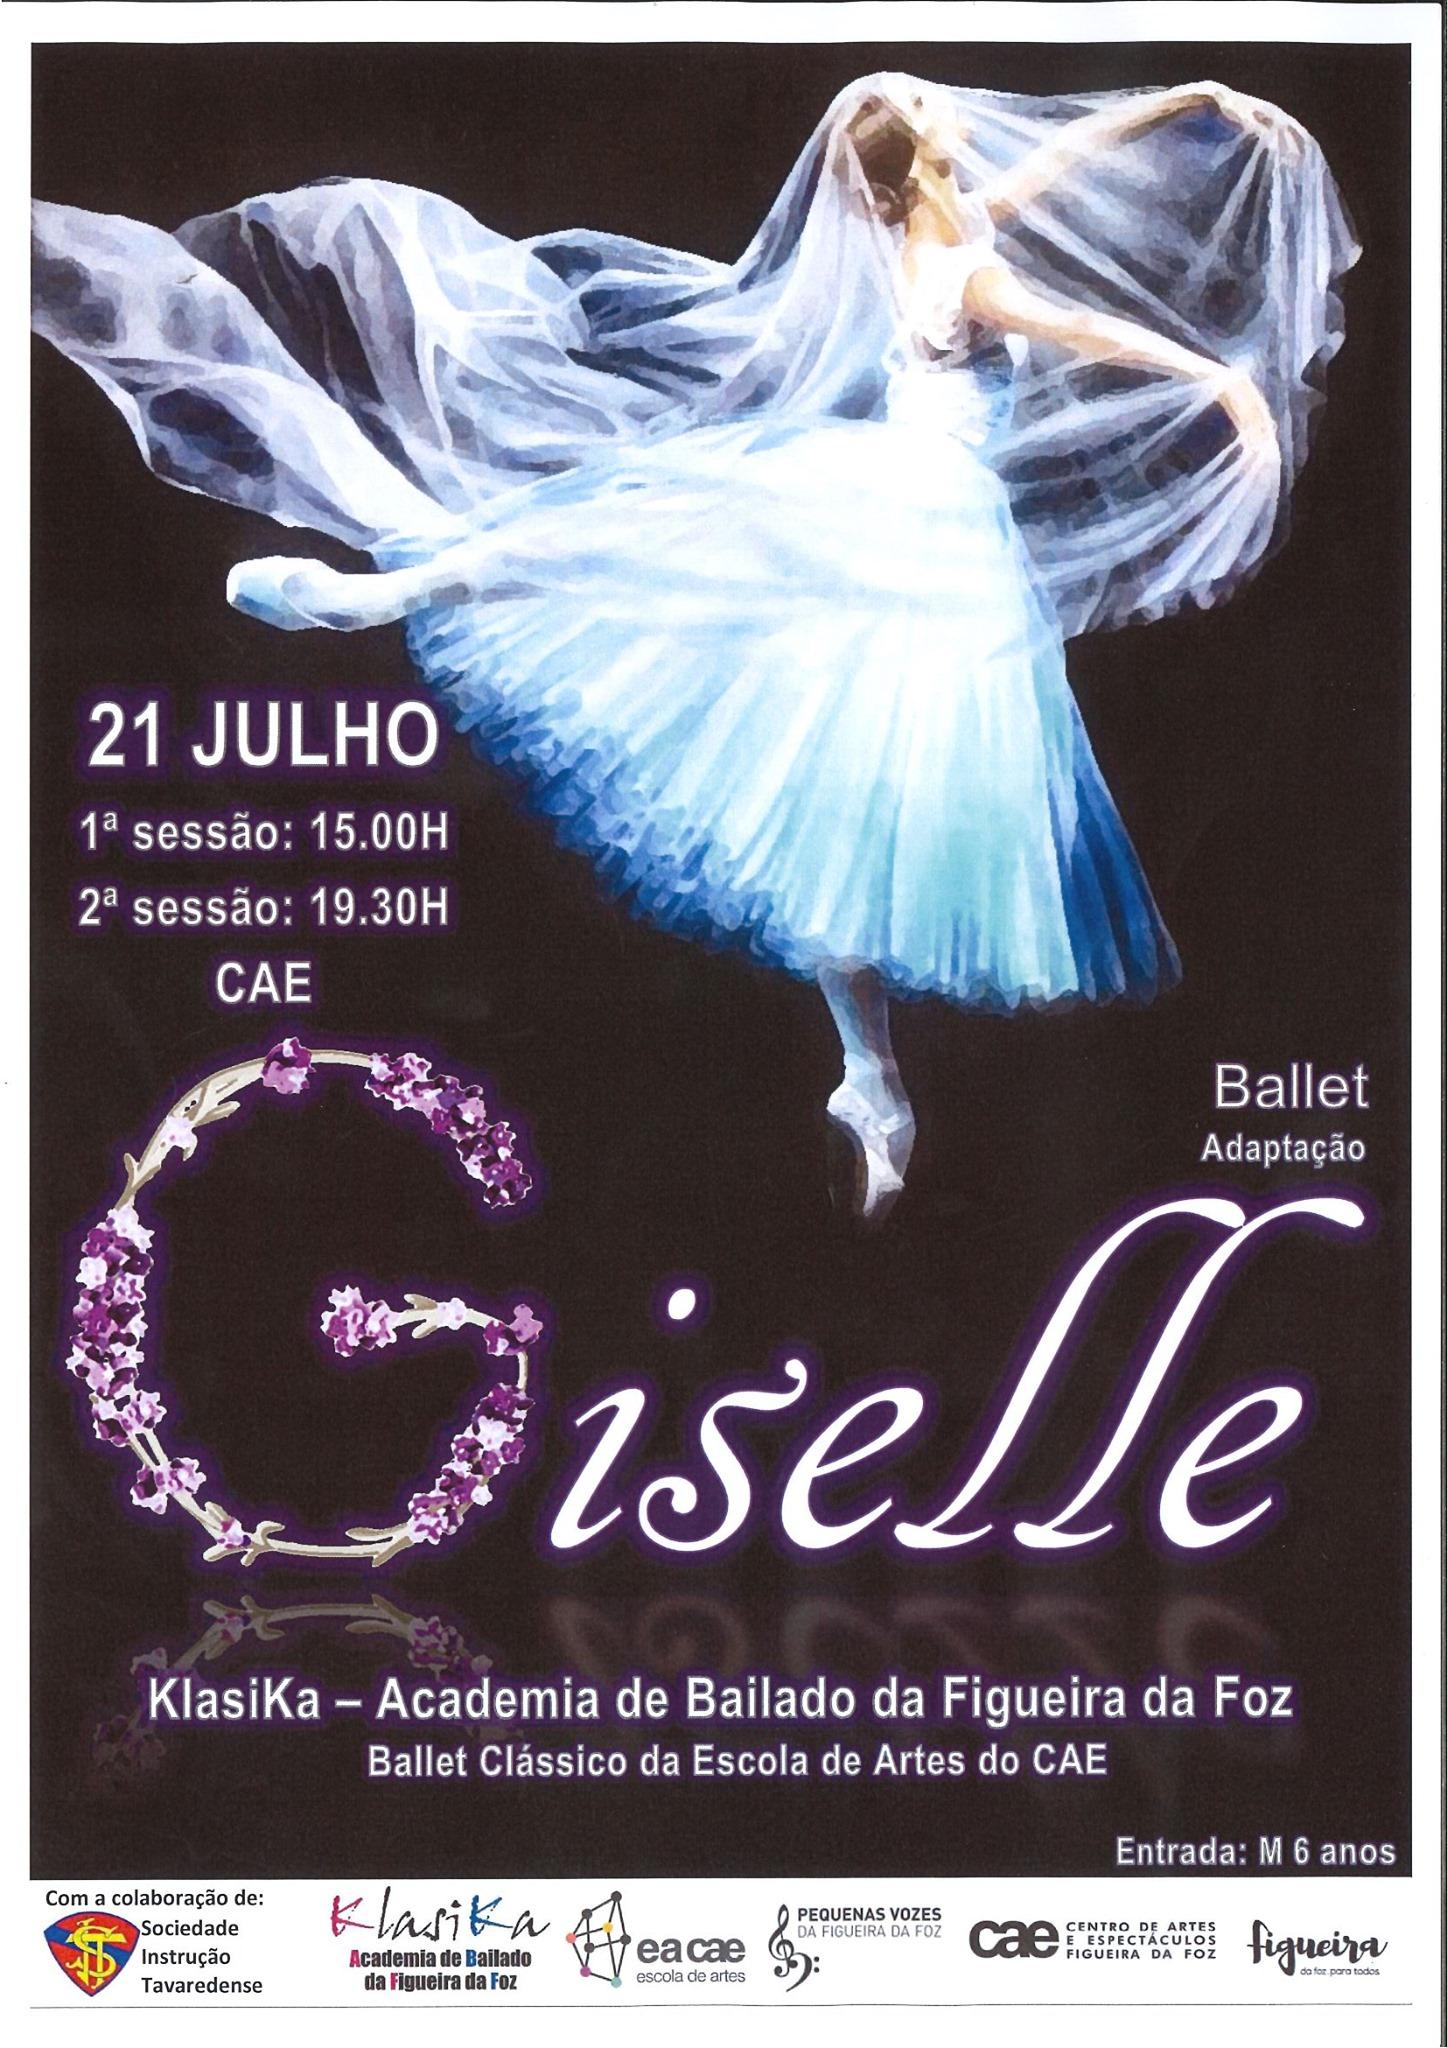 Giselle, pela Klasika - Academia de Bailado da Figueira da Foz   EACAE